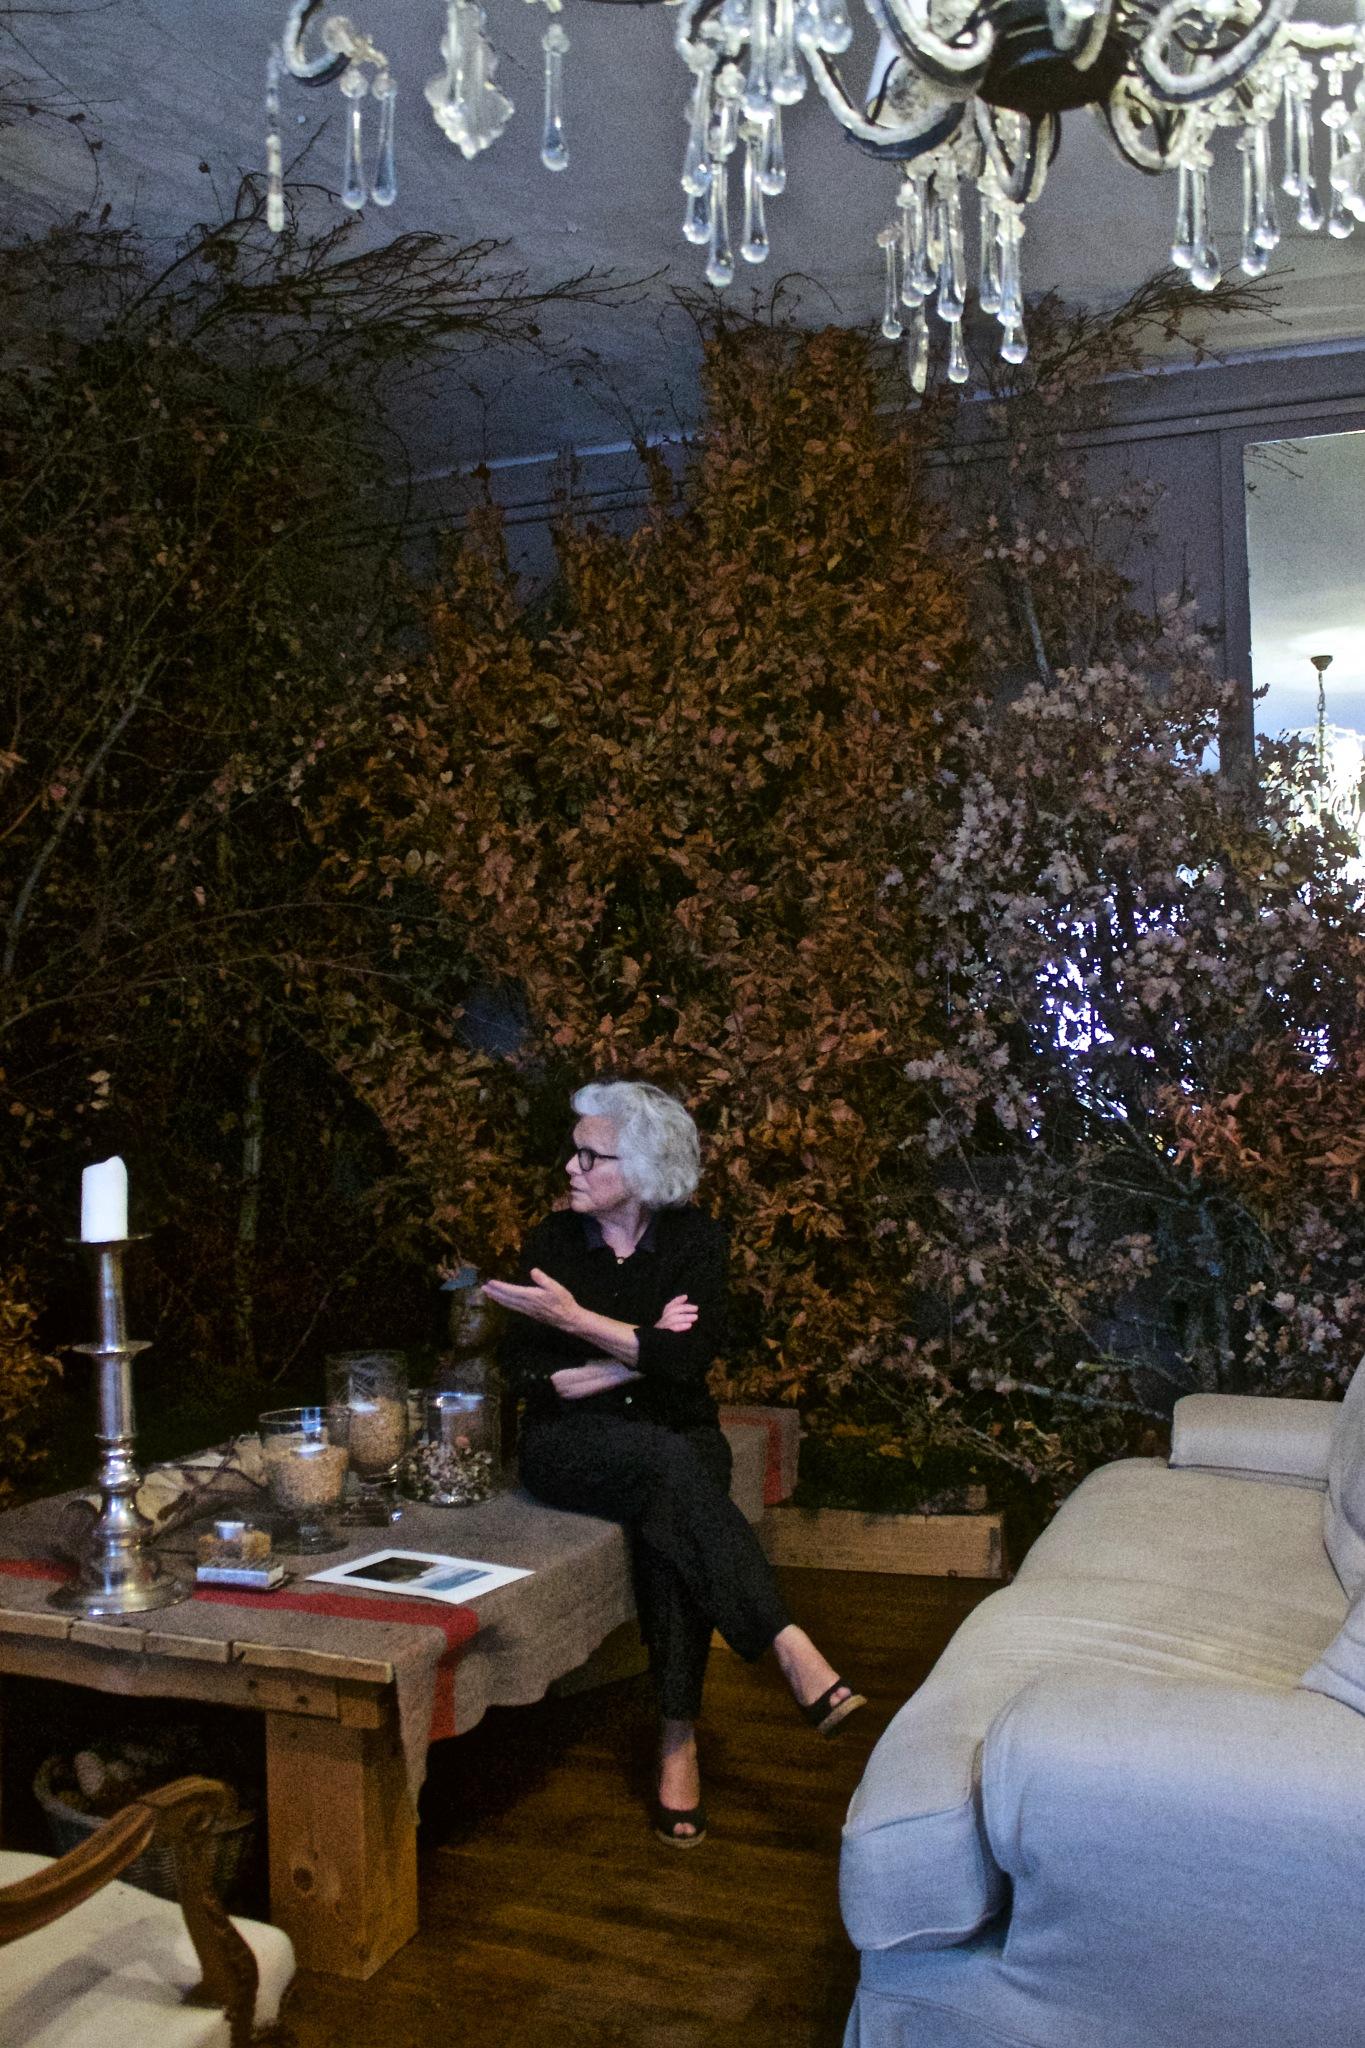 Catherine Painvin, créatrice de Tartine & Chocolat pause dans son salon avec ses arbres by FJA RAYNAL